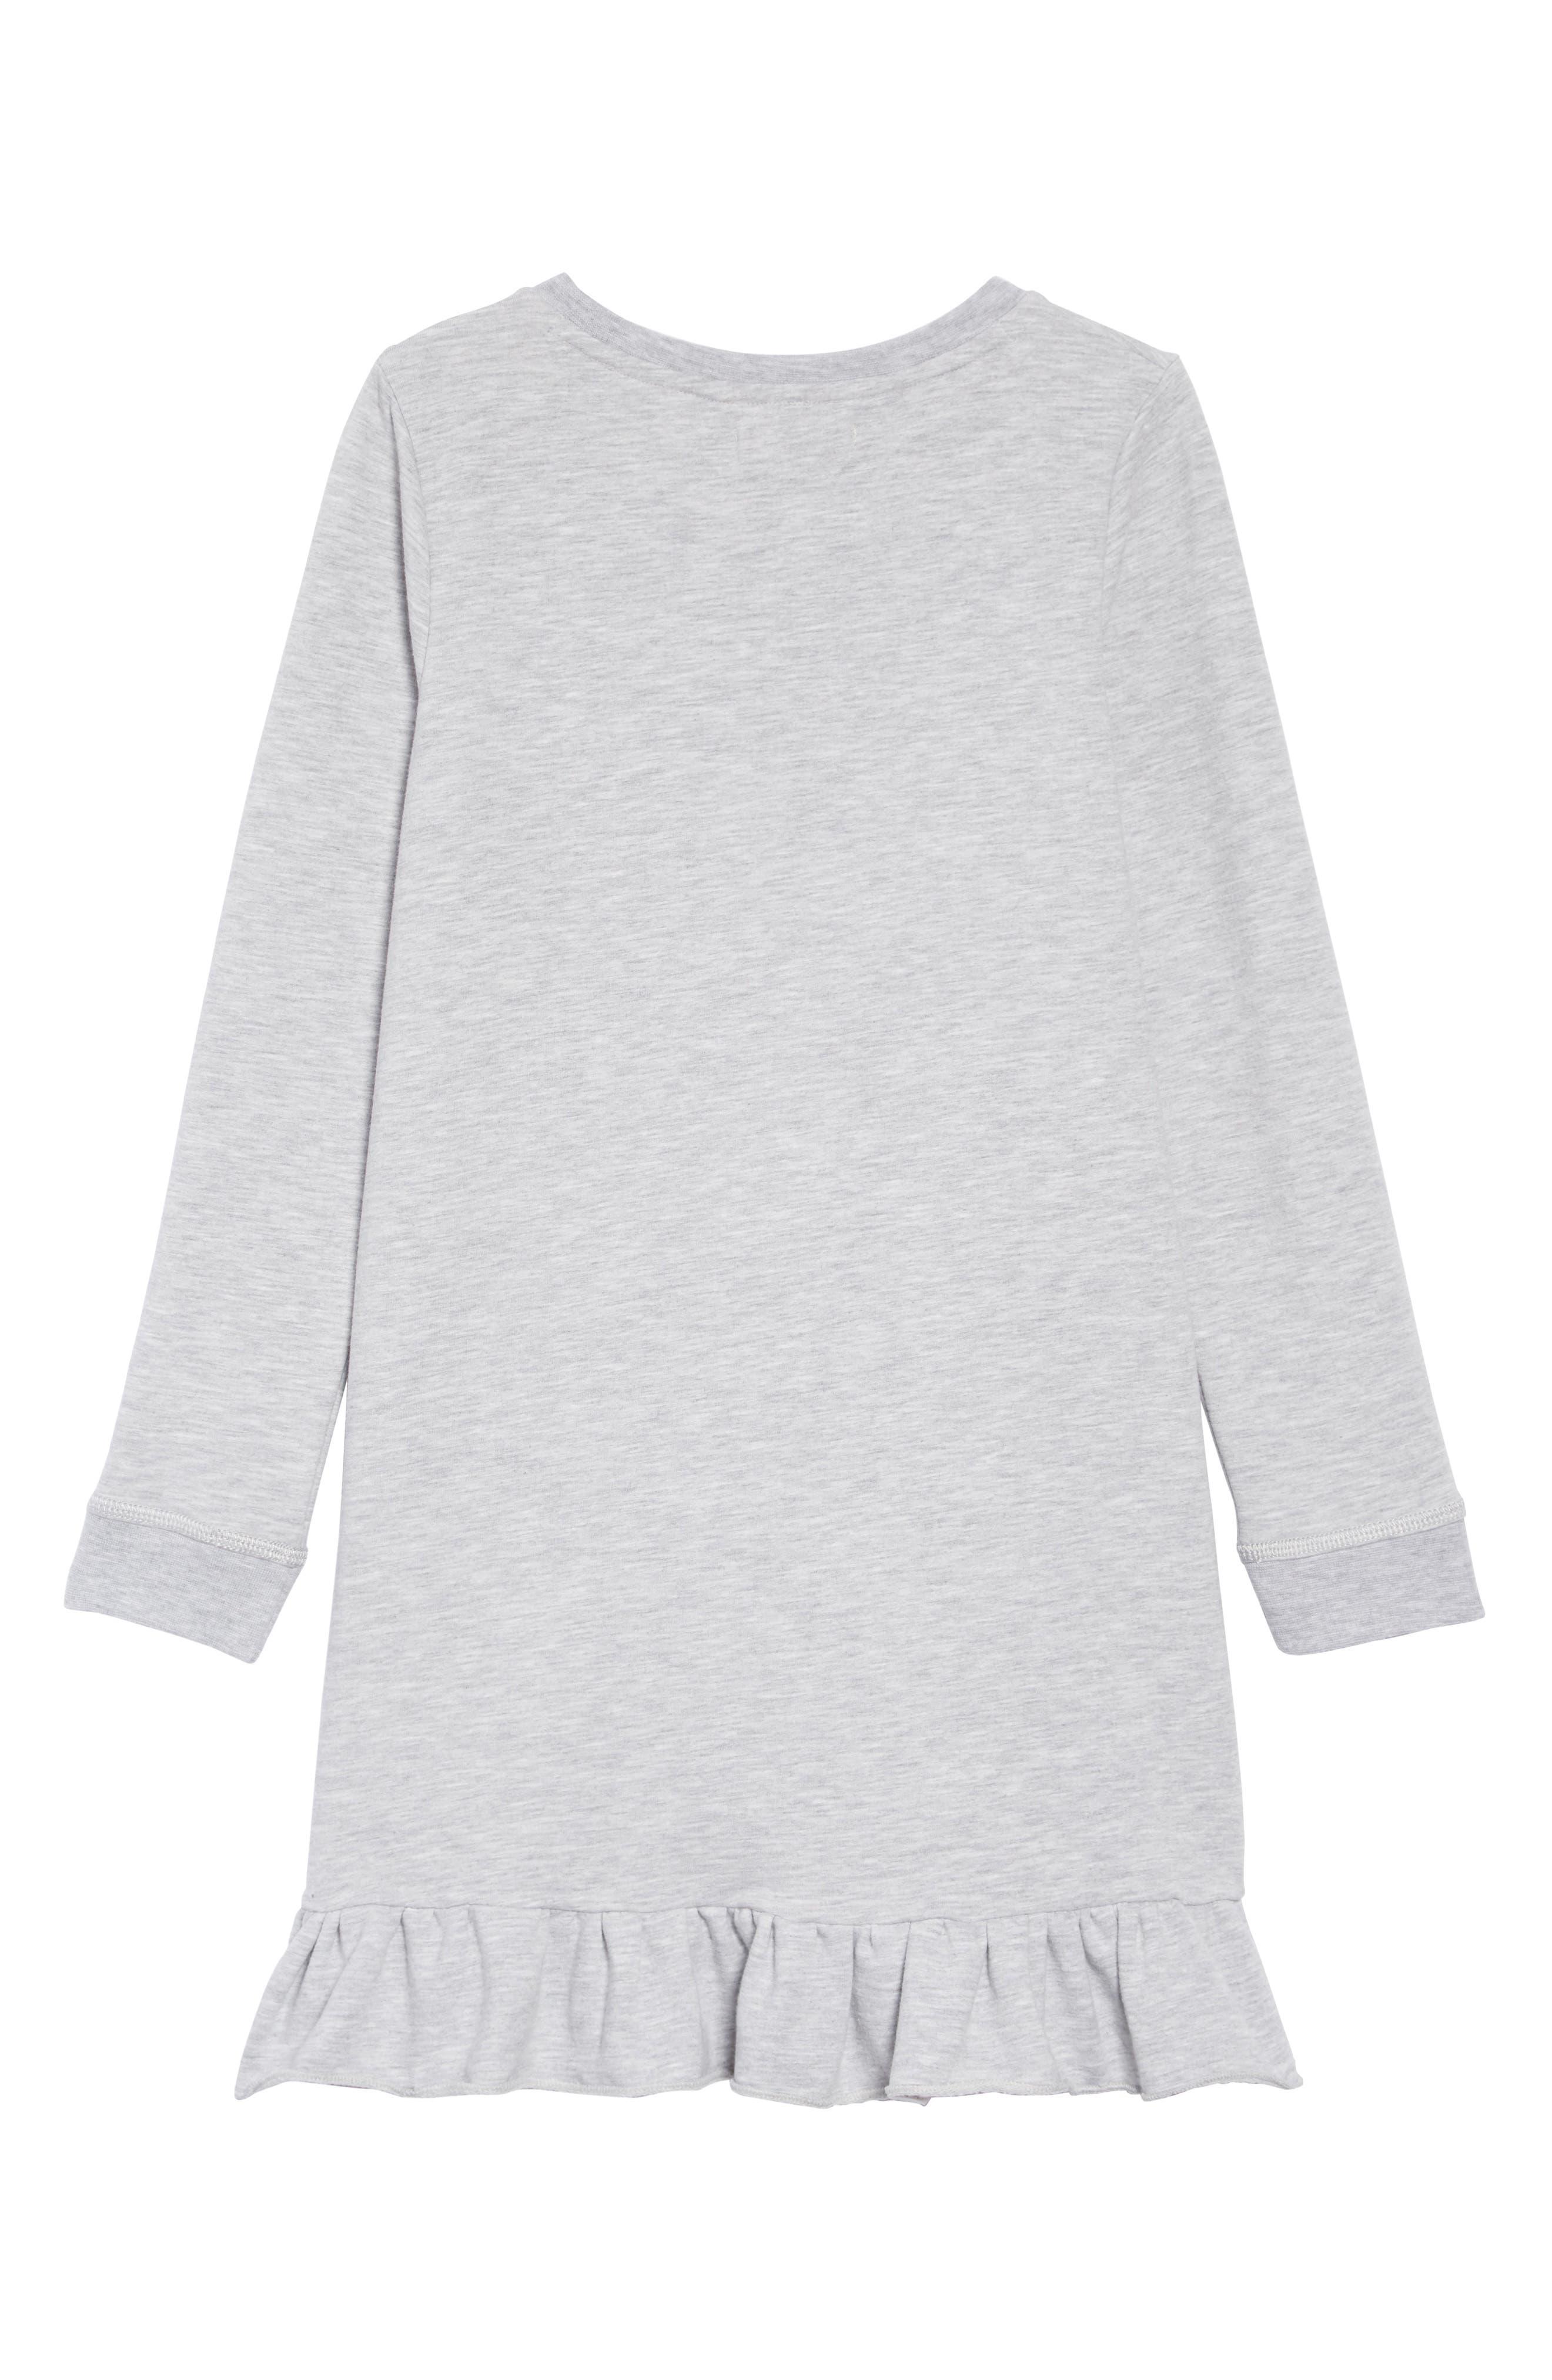 Ruffle Hem Fleece Dress,                             Alternate thumbnail 2, color,                             GREY ASH HEATHER